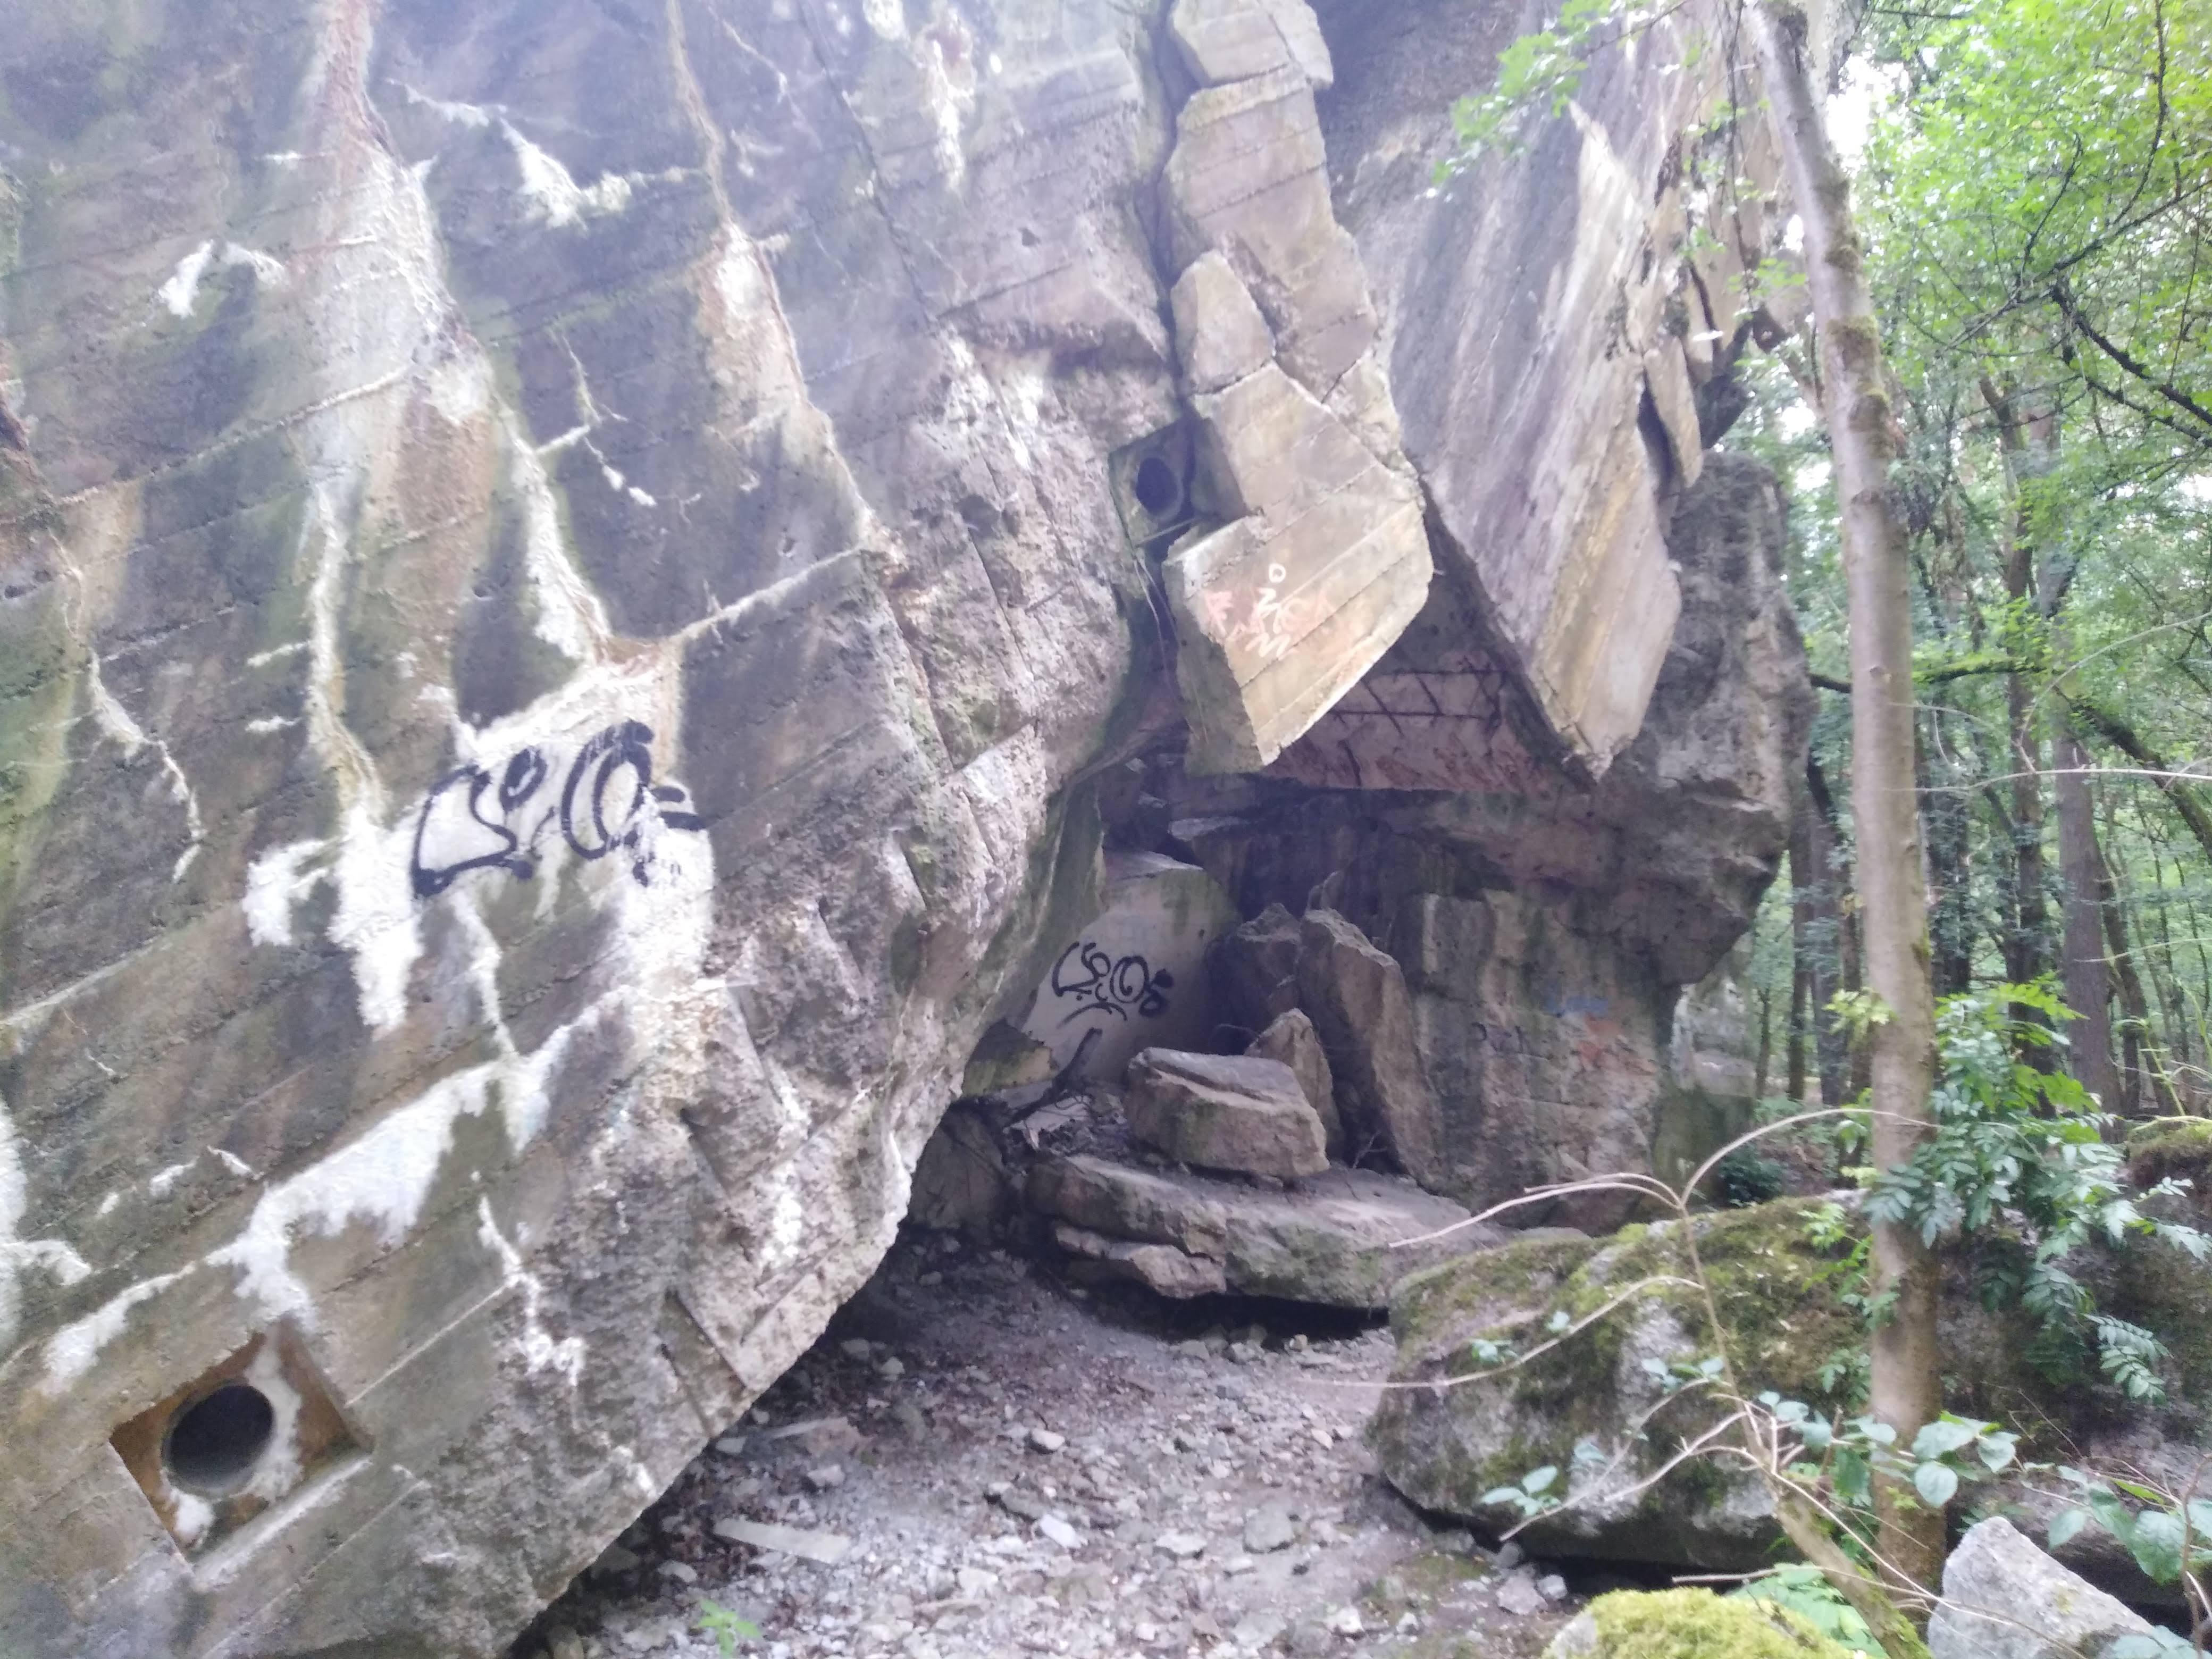 Wanderung Nähe Lanke / Lobetal: Ruine vom Lager Koralle